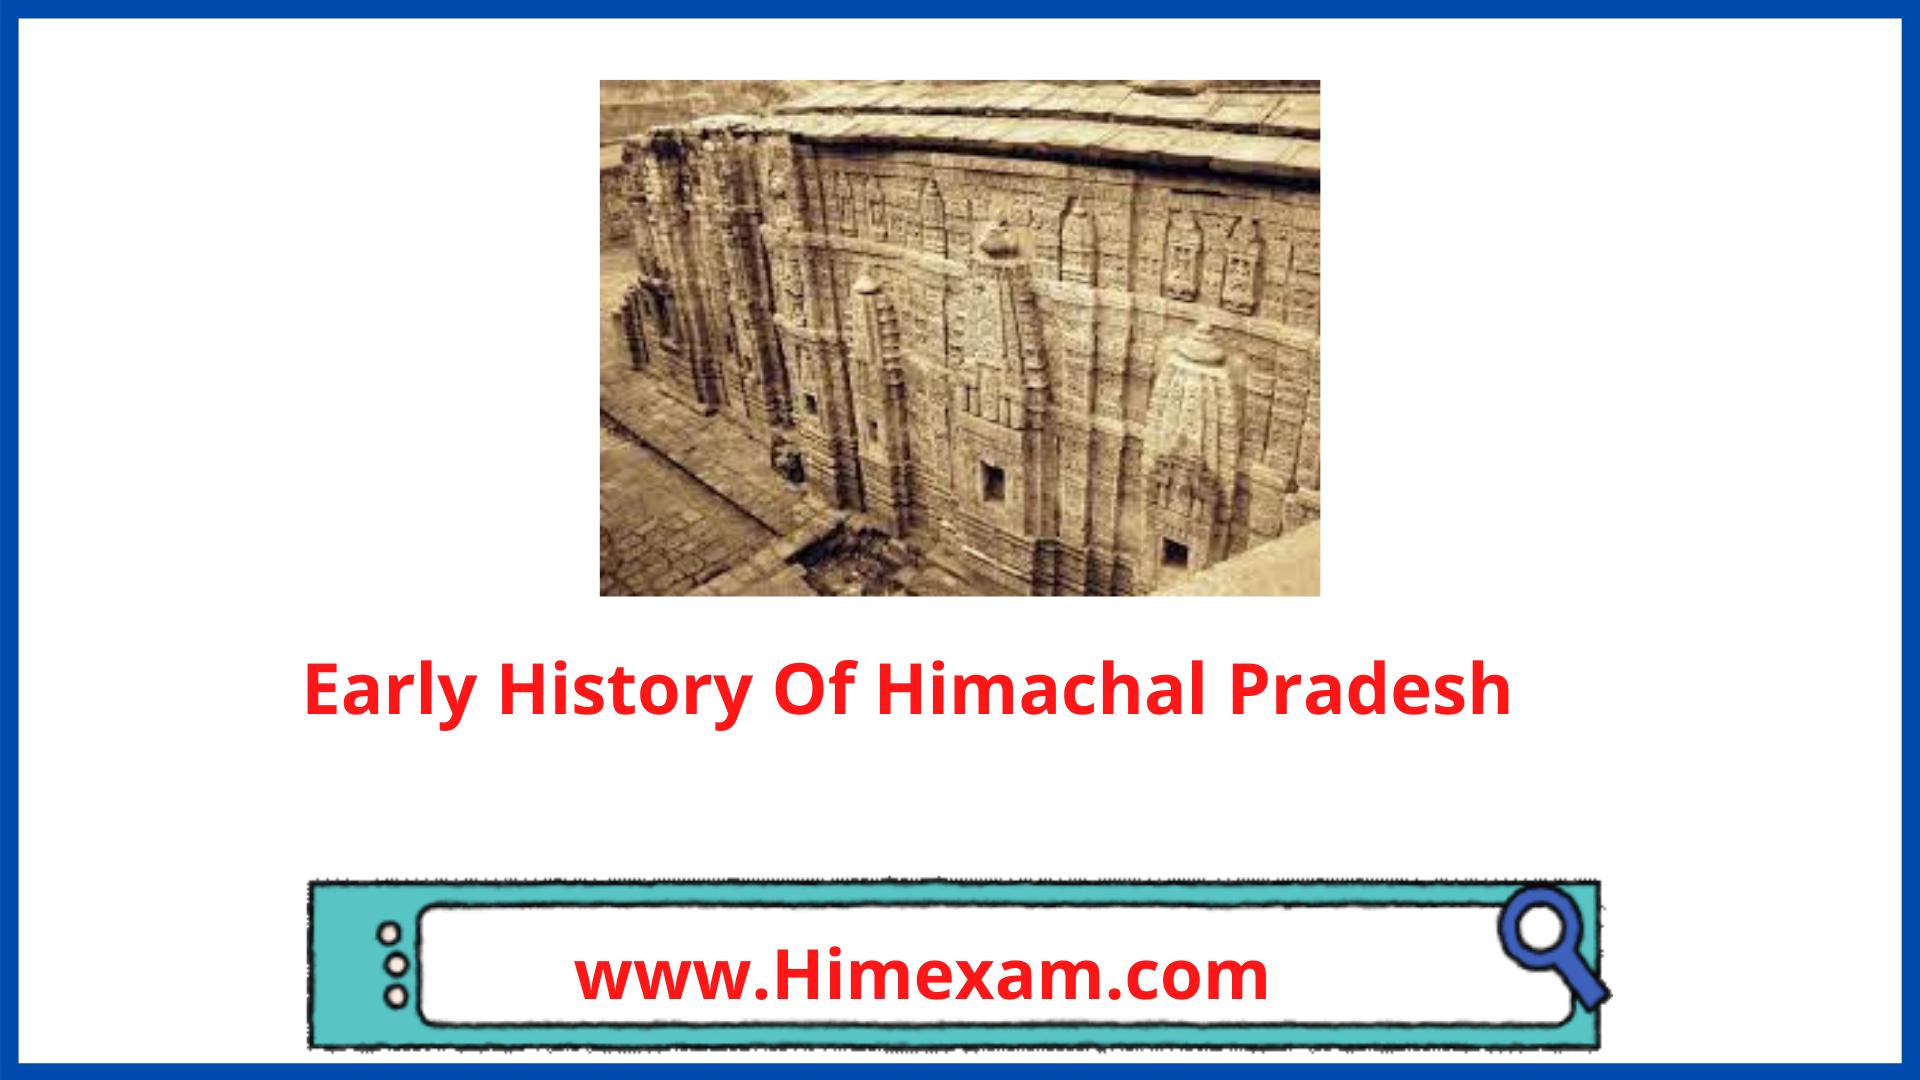 Early History Of Himachal Pradesh